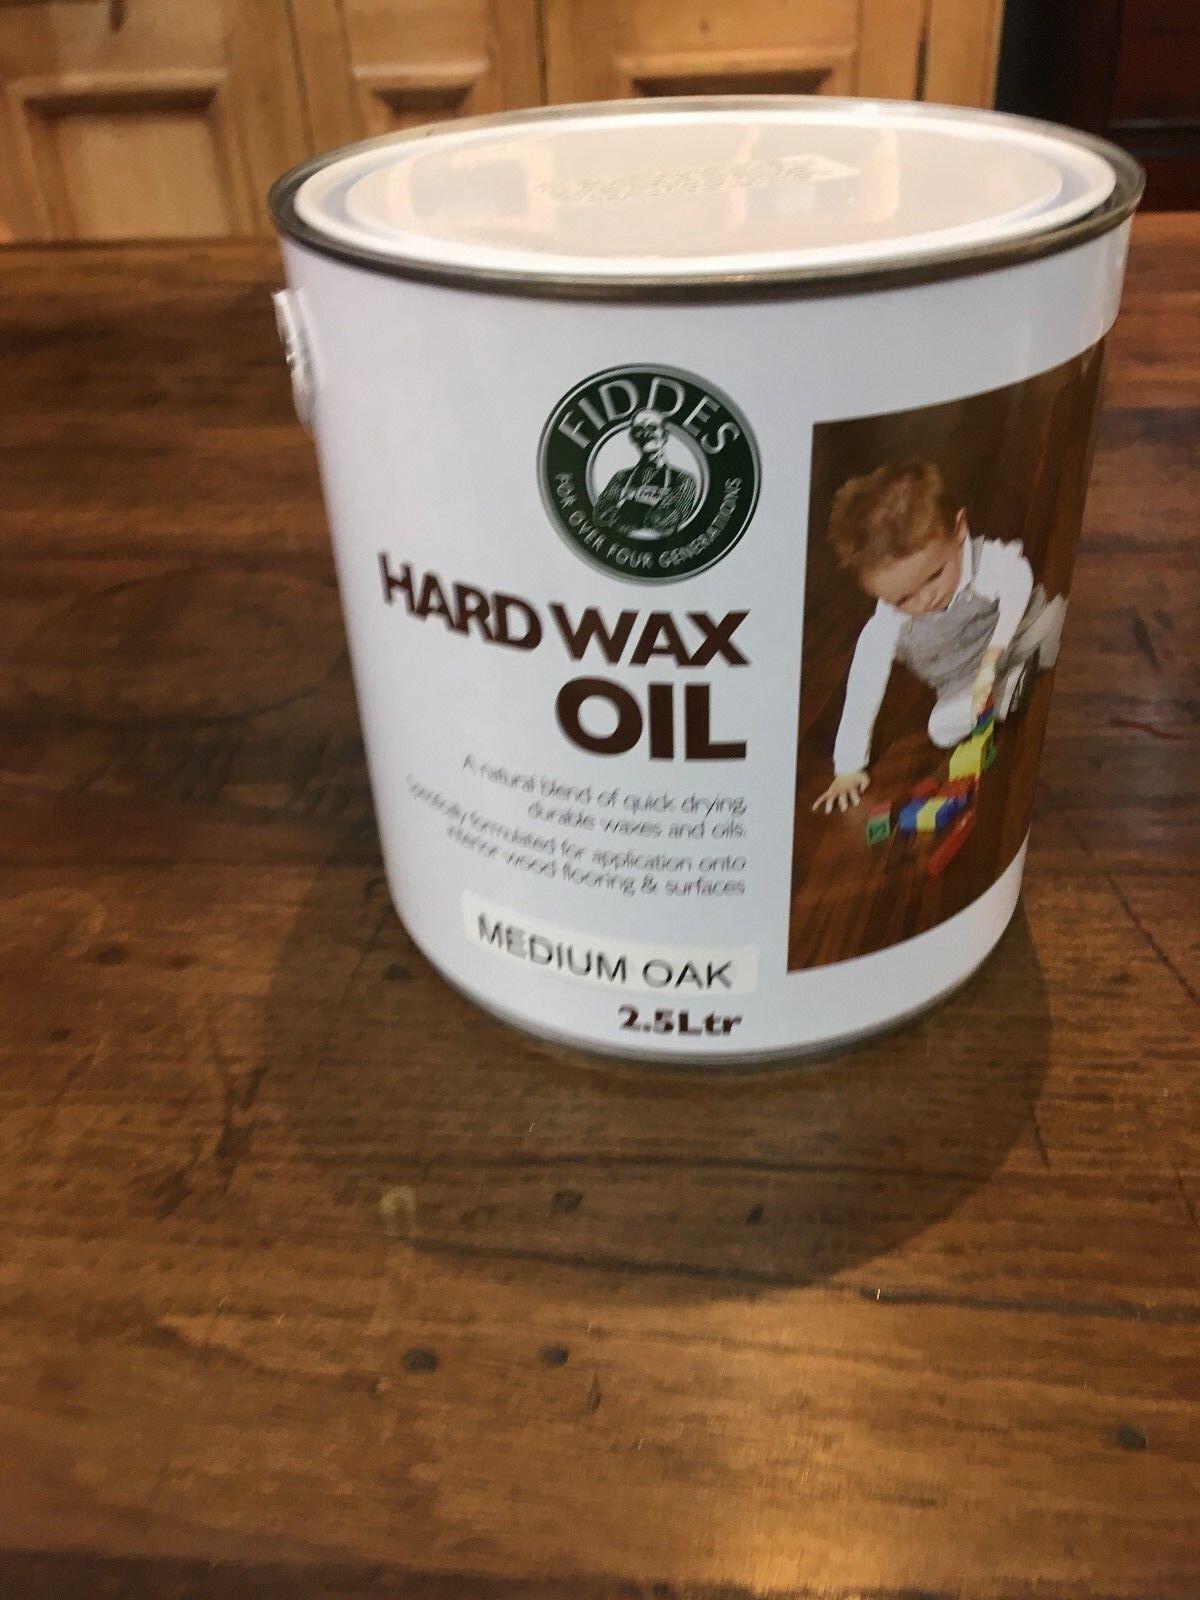 Fiddes hard wax oil Medium Oak 2.5 litre